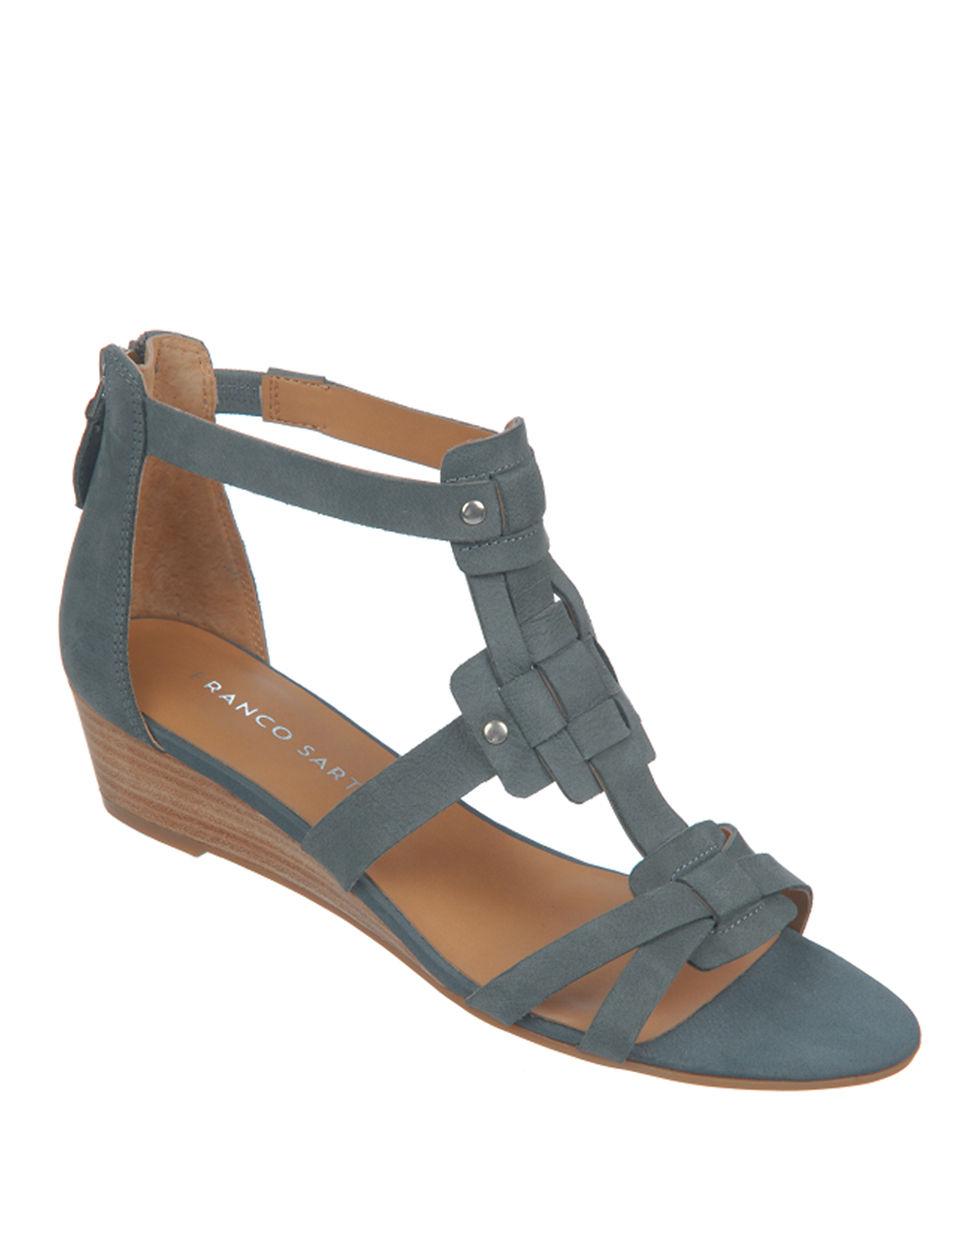 franco sarto ulysses nubuck leather wedge sandals in blue